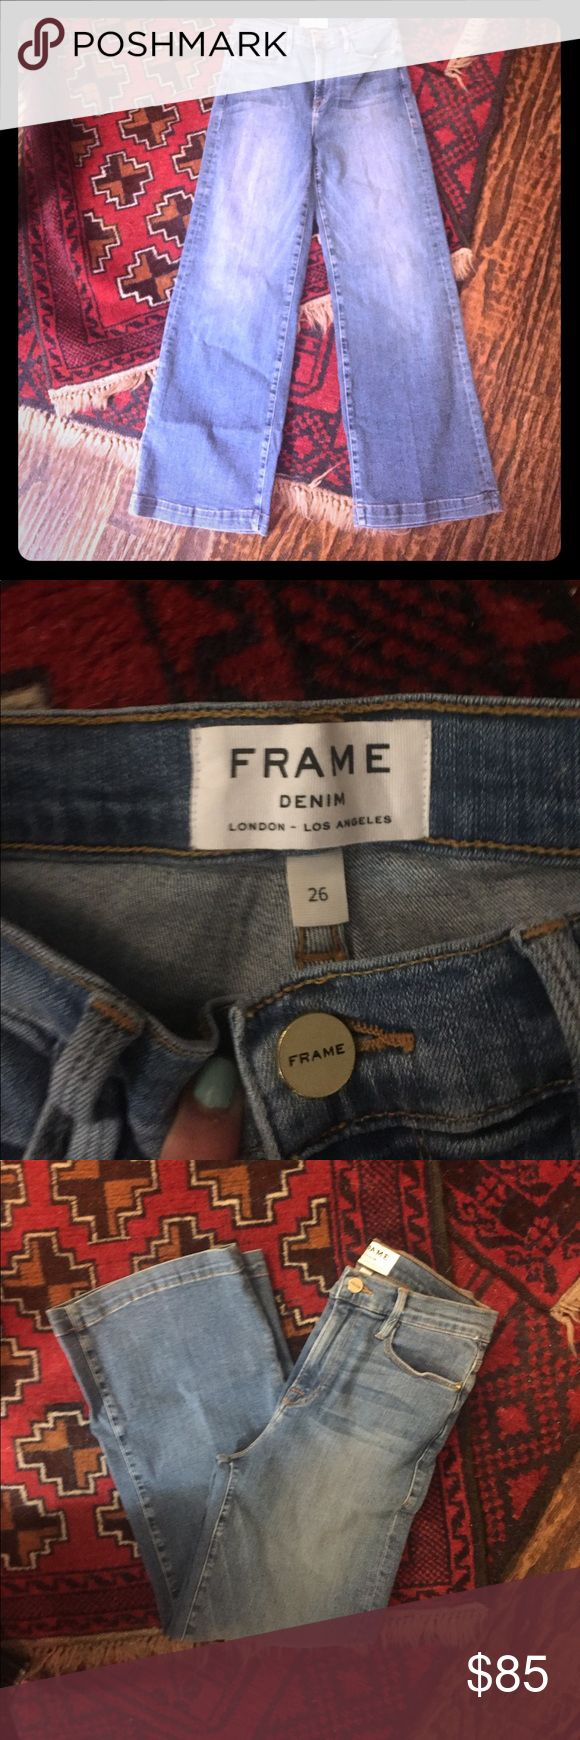 NWT FRAME DENIM cropped flare NWT!!! FRAME DENIM culottes in midland blue. Frame Denim Jeans Ankle & Cropped